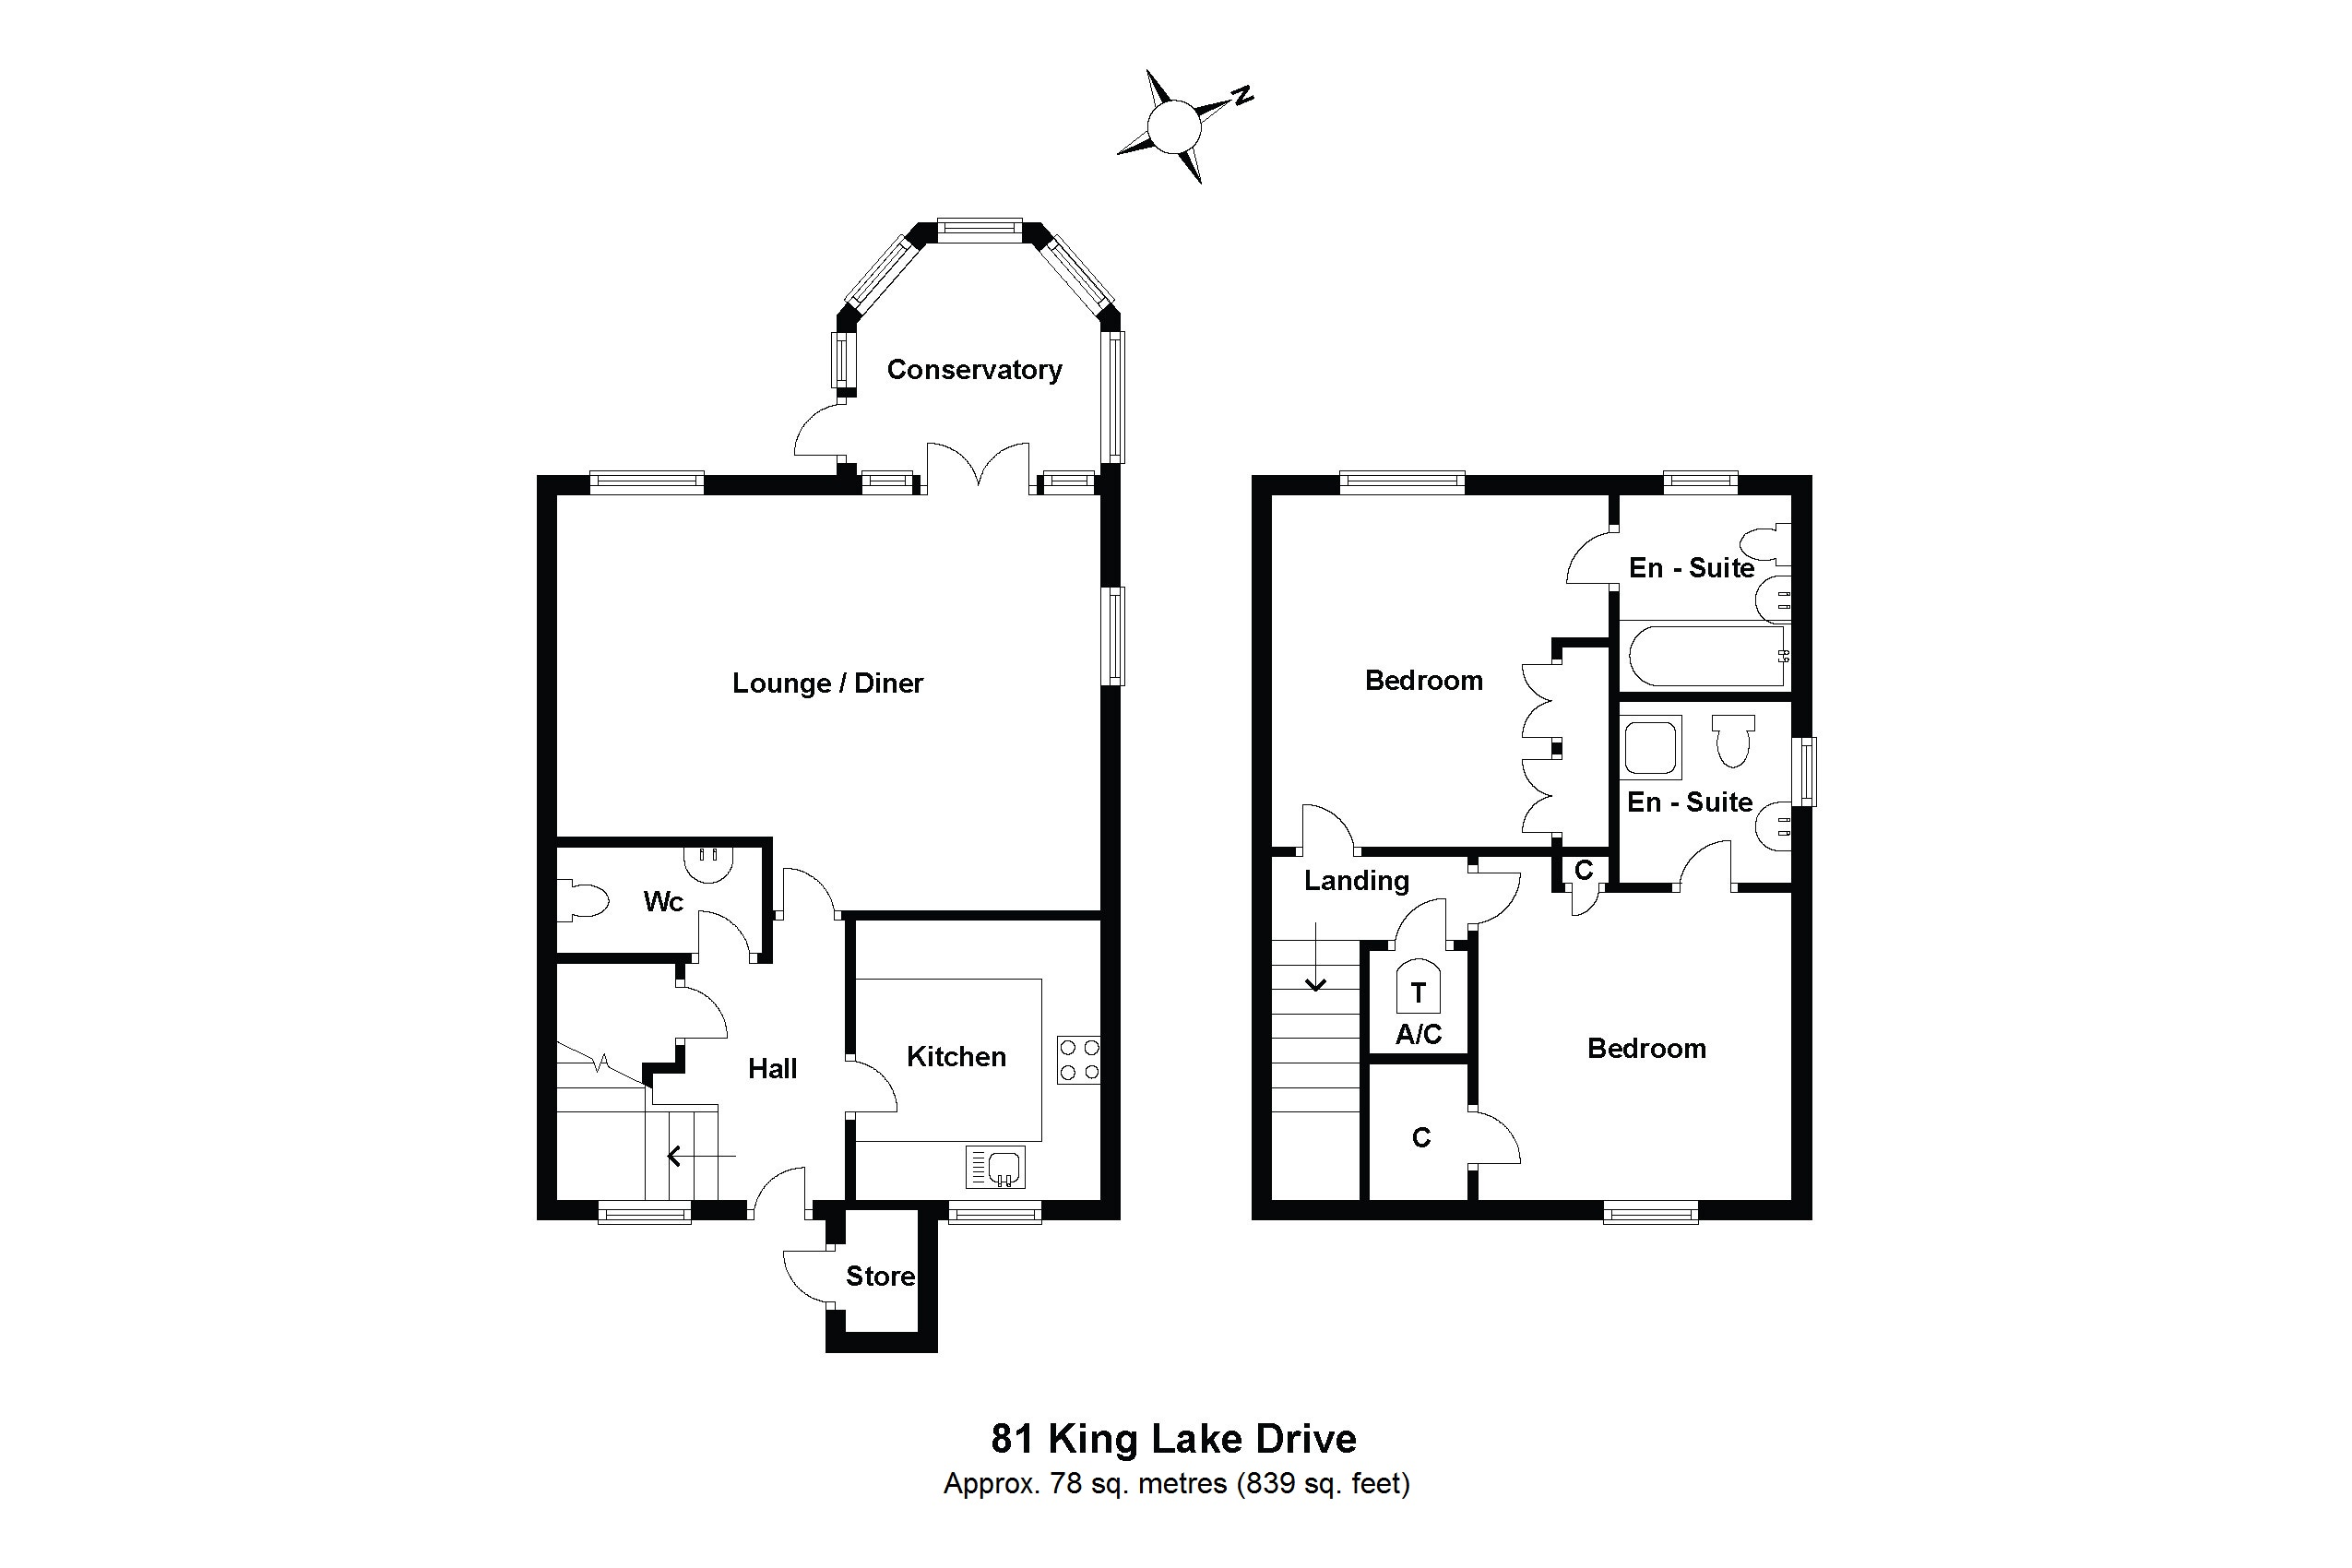 81 Kinglake Drive Floorplan